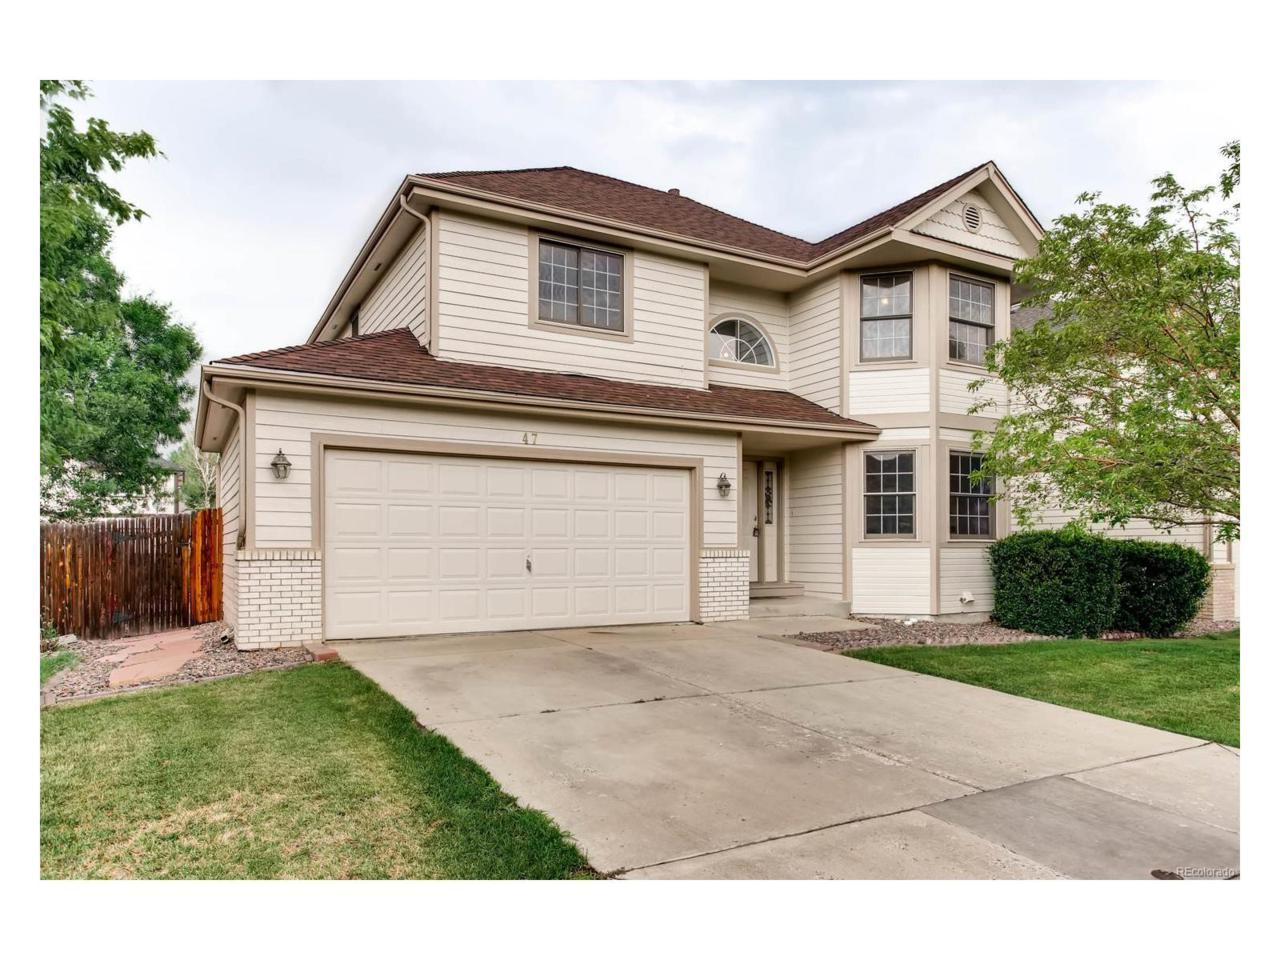 8501 W Union Avenue #47, Denver, CO 80123 (MLS #8180460) :: 8z Real Estate